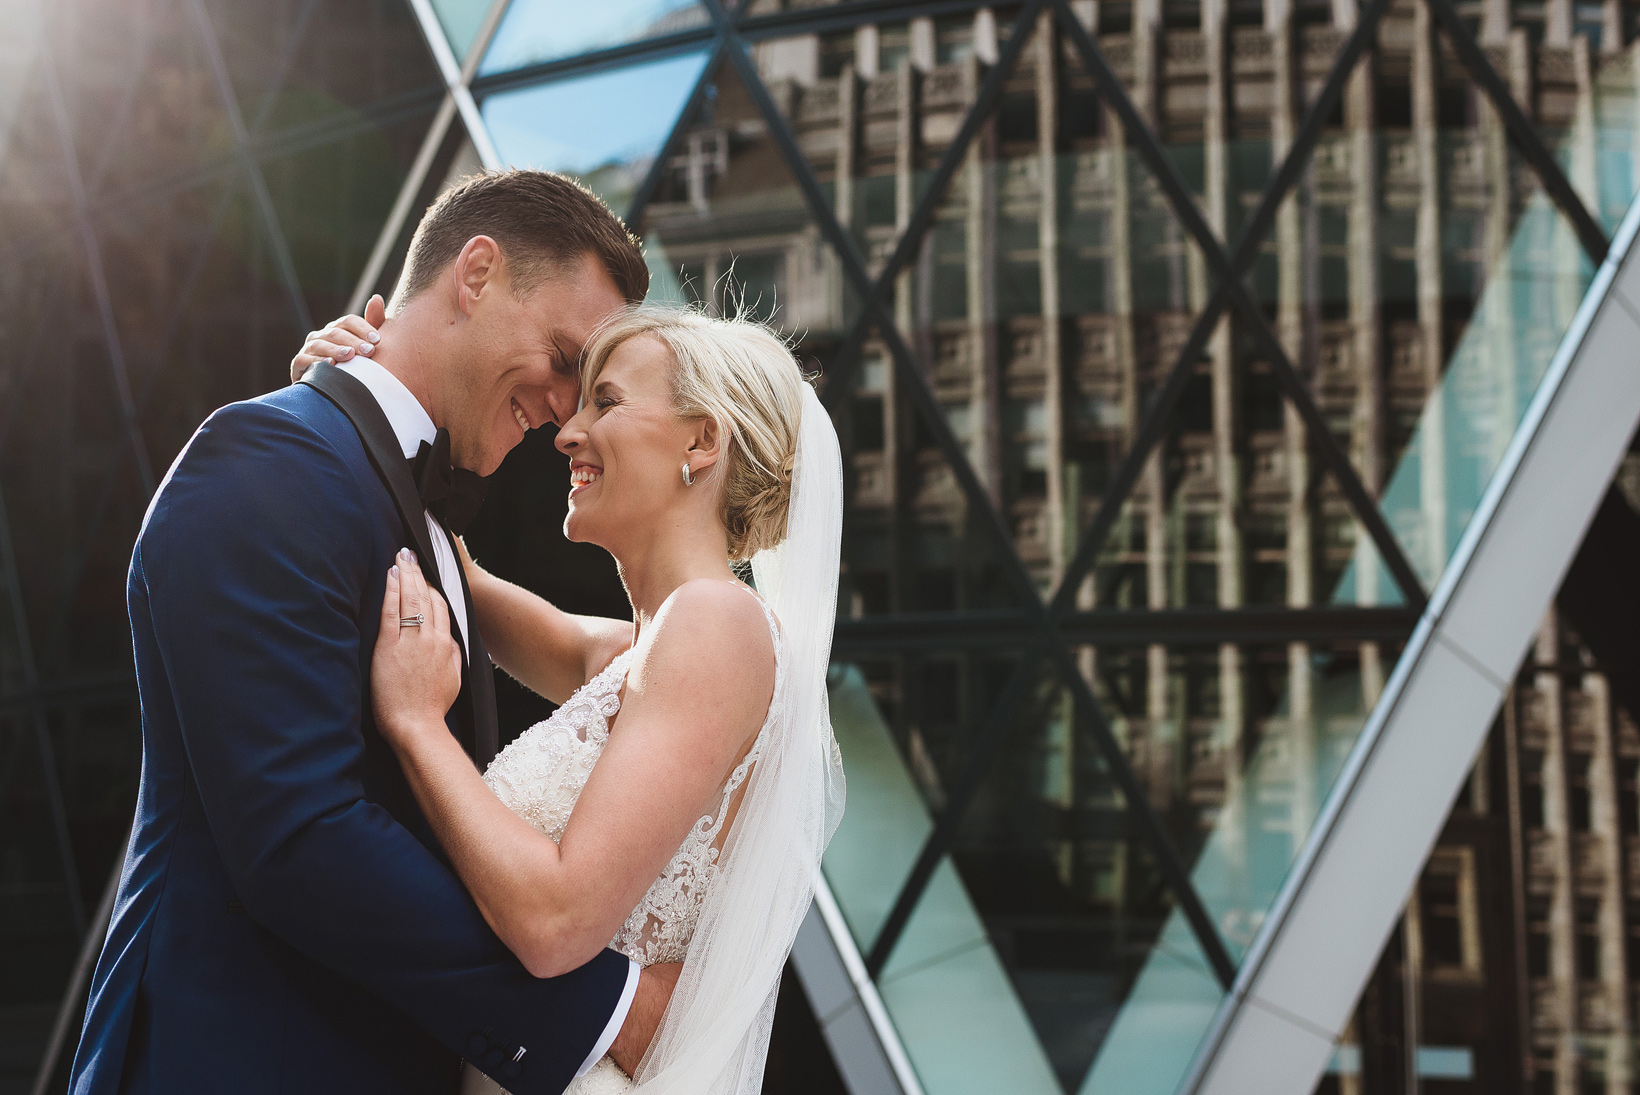 Gherkin Wedding Photography